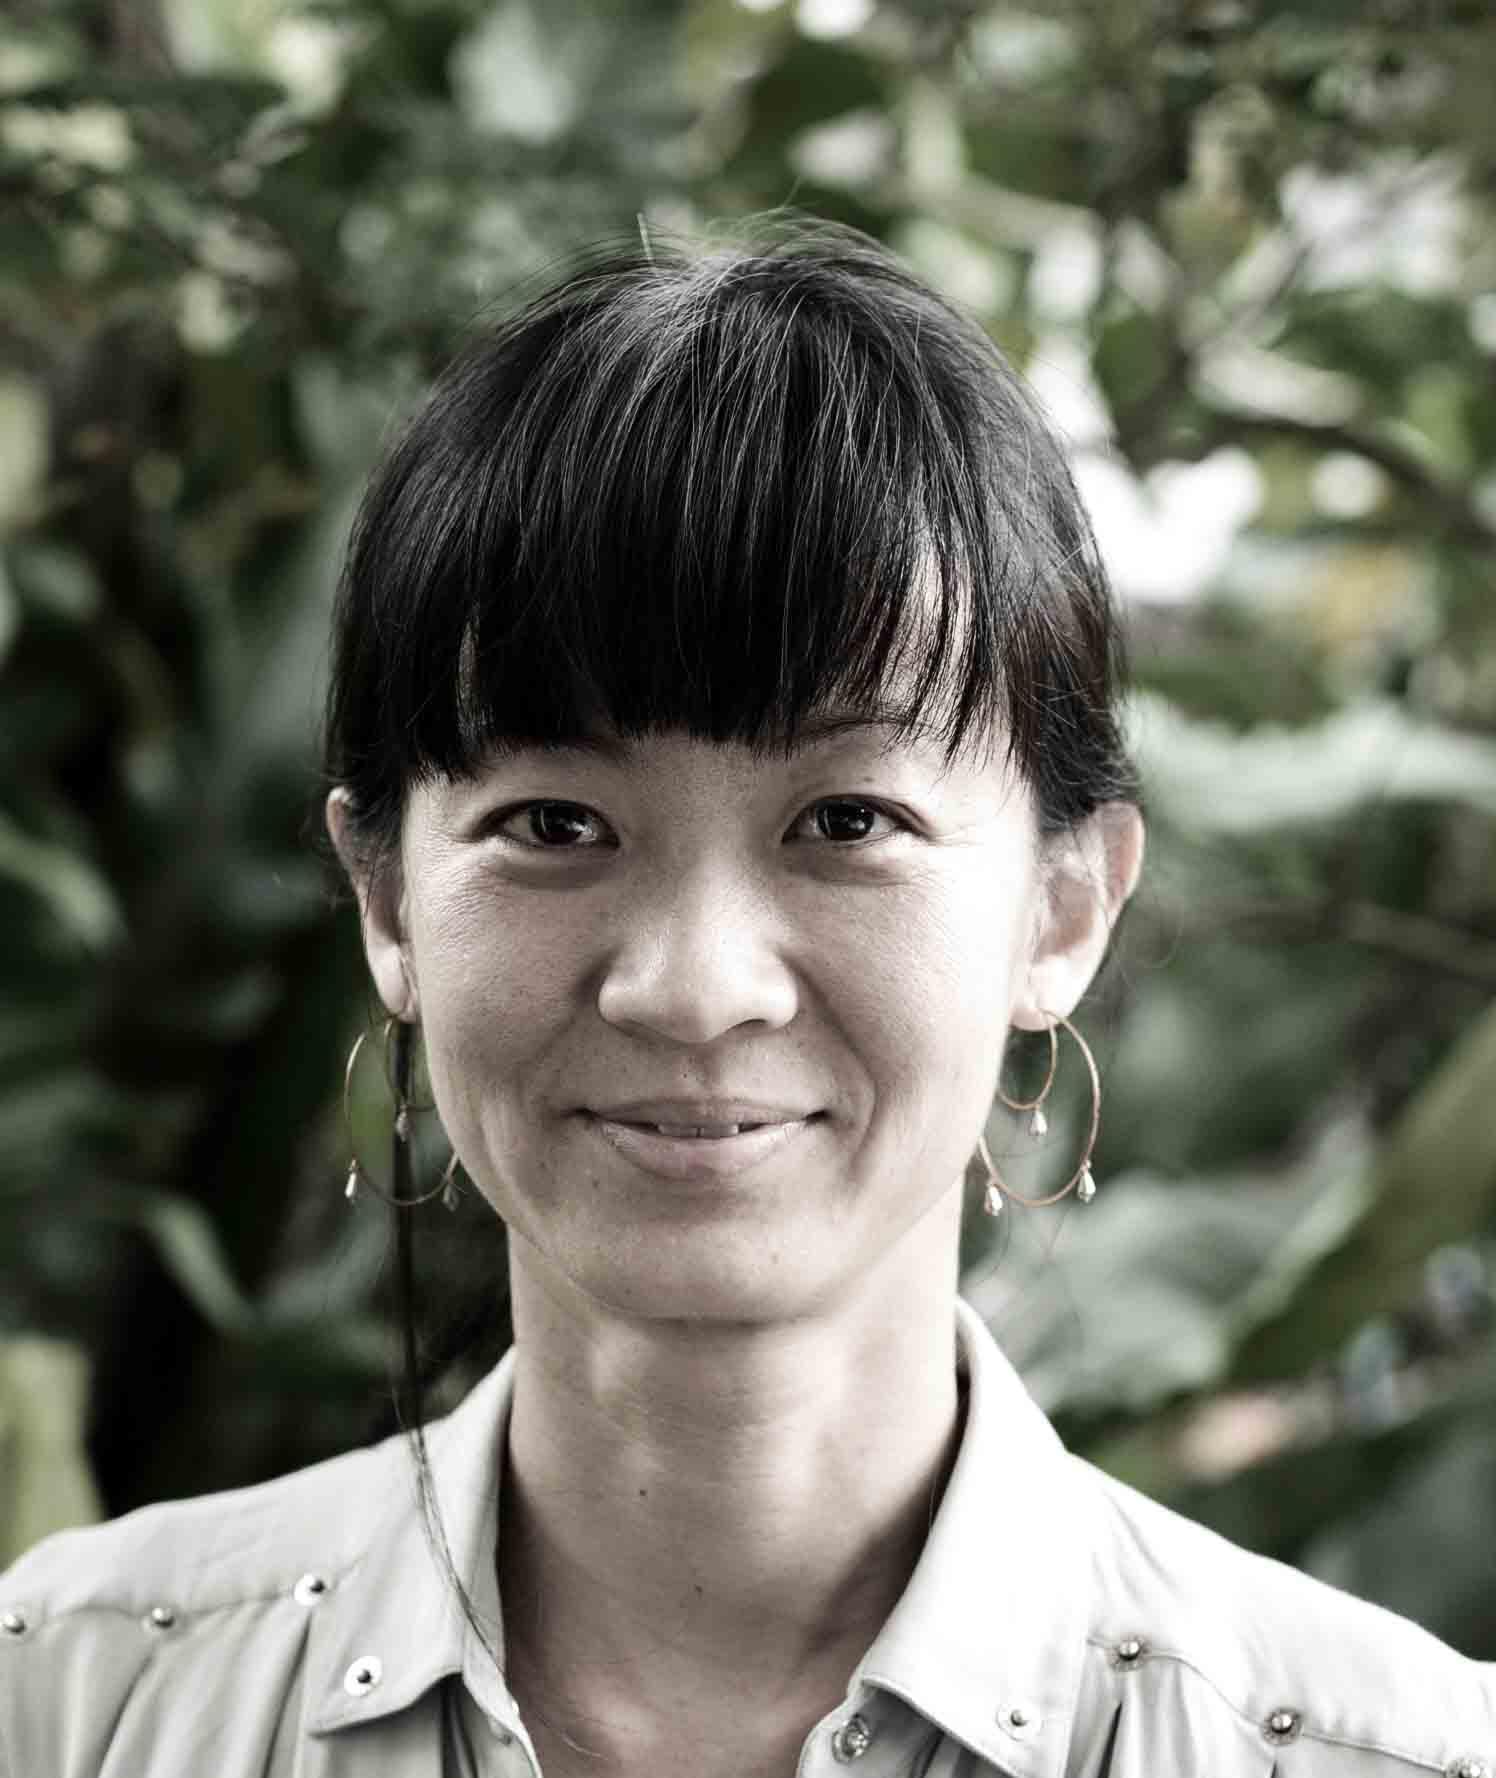 Kelly-singapore-award-winning-architect-firm